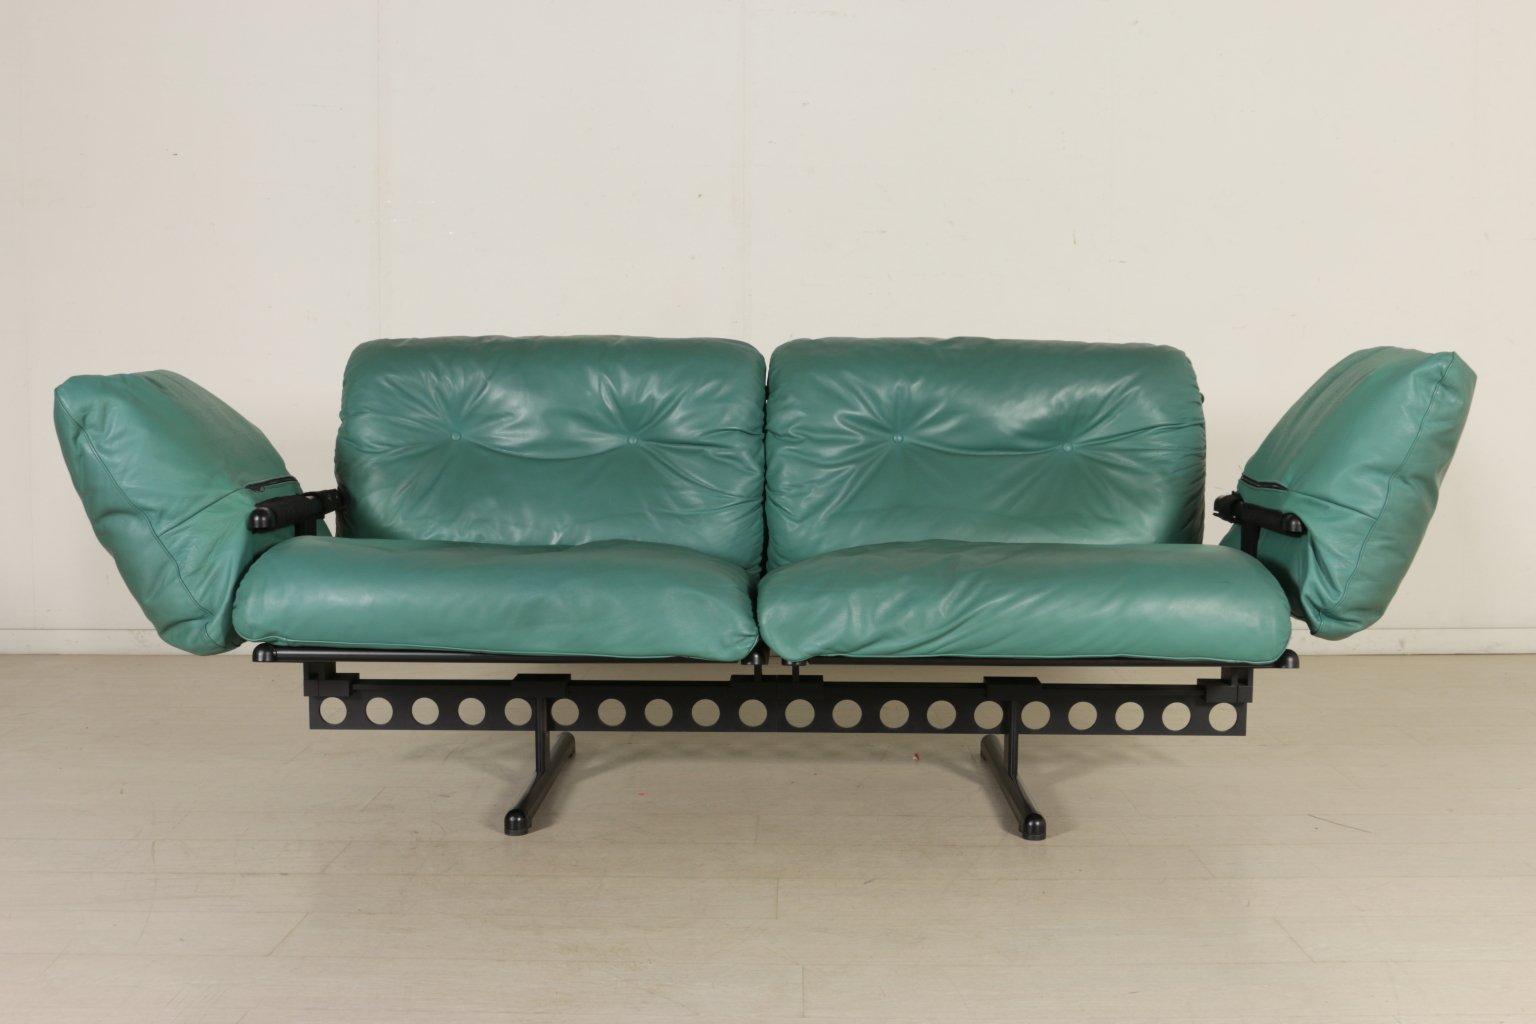 poltrona frau sofa: mantÒ sofas from poltrona frau architonic.